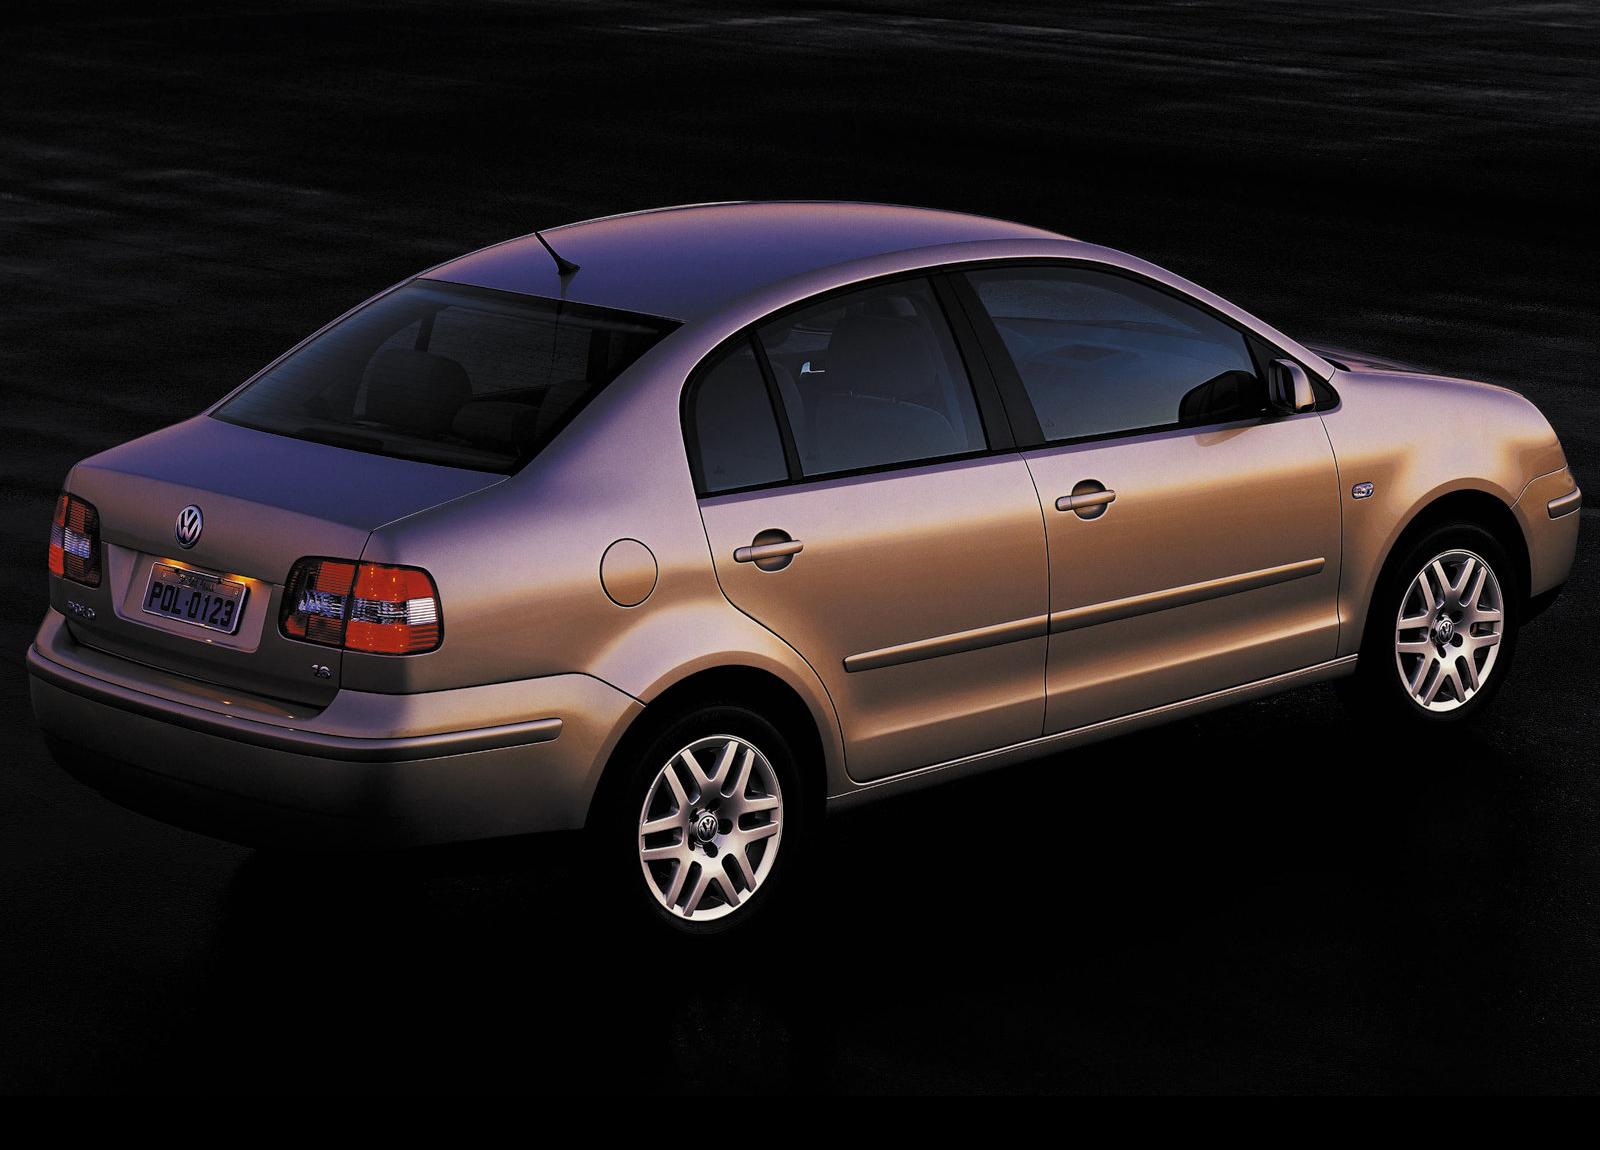 2003 Volkswagen Polo Sedan Hd Pictures Carsinvasion Com